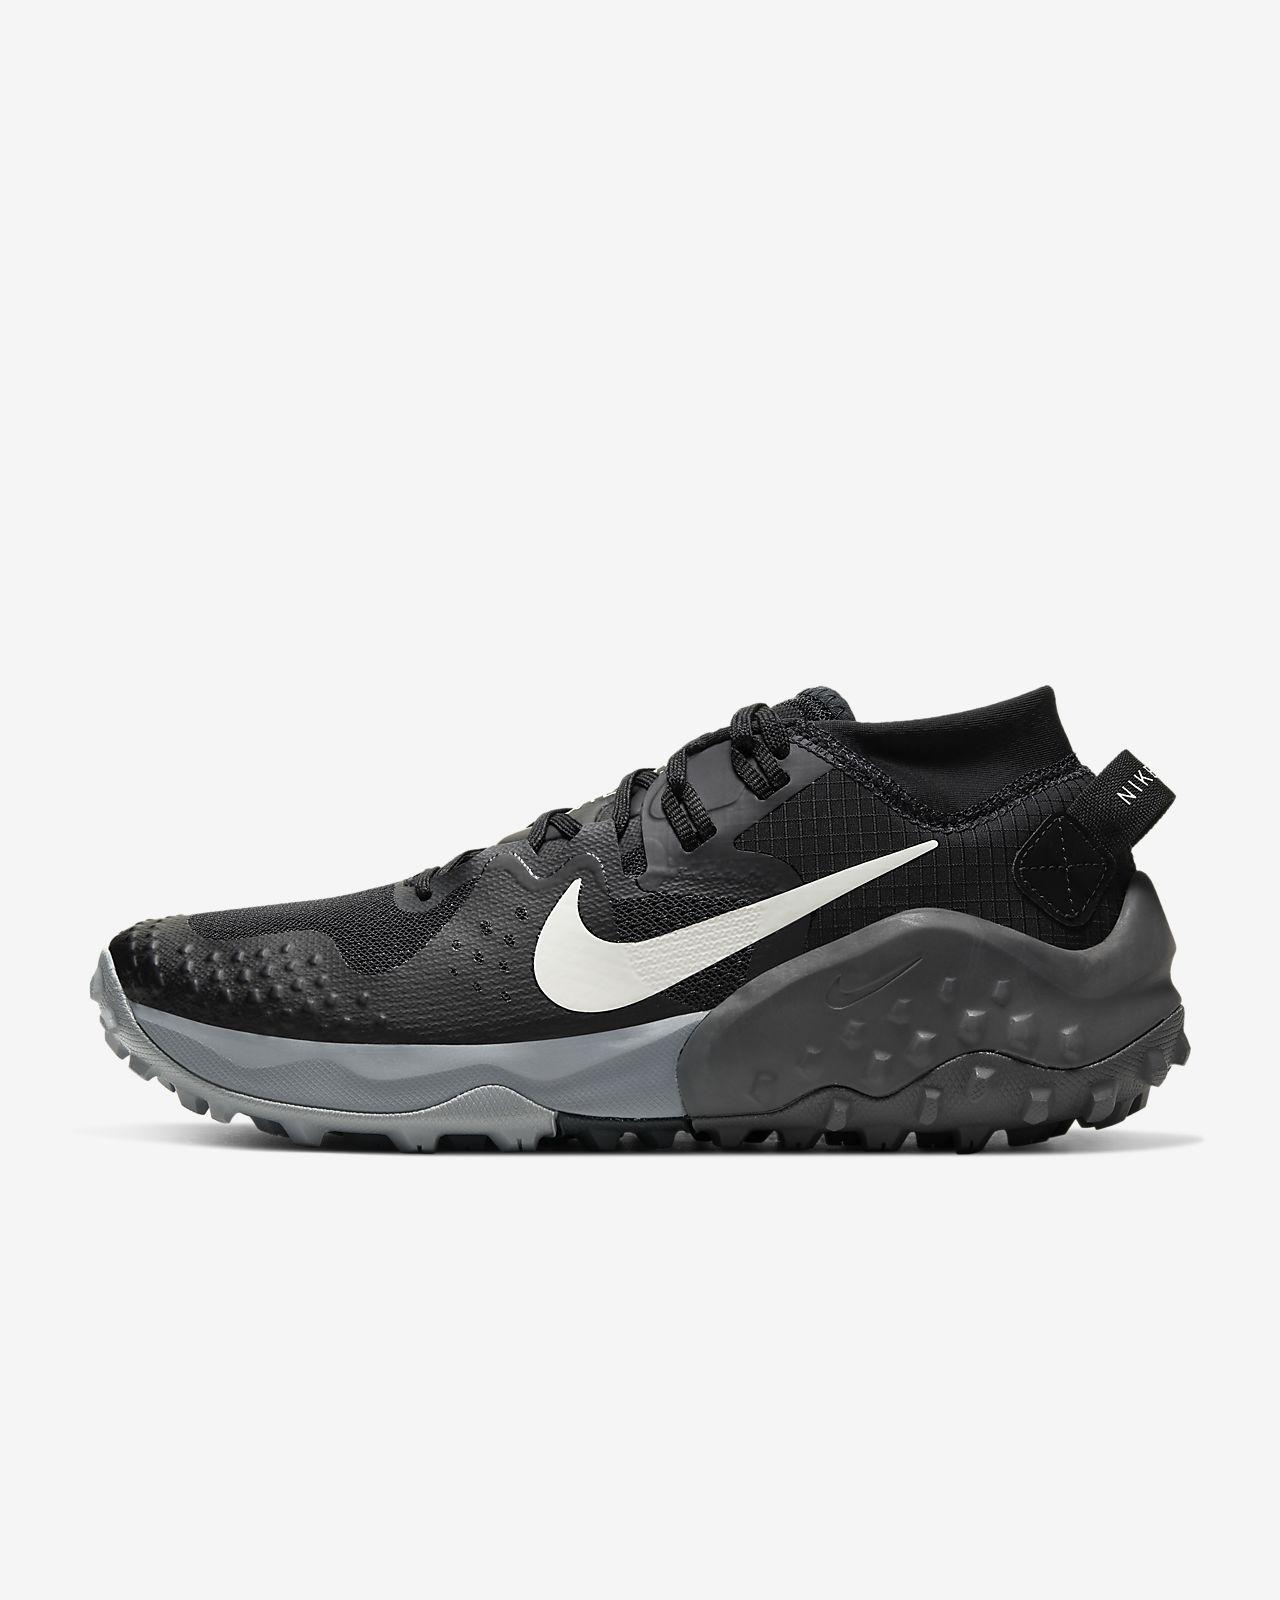 Chaussure de running sur sentier Nike Wildhorse 6 pour Femme